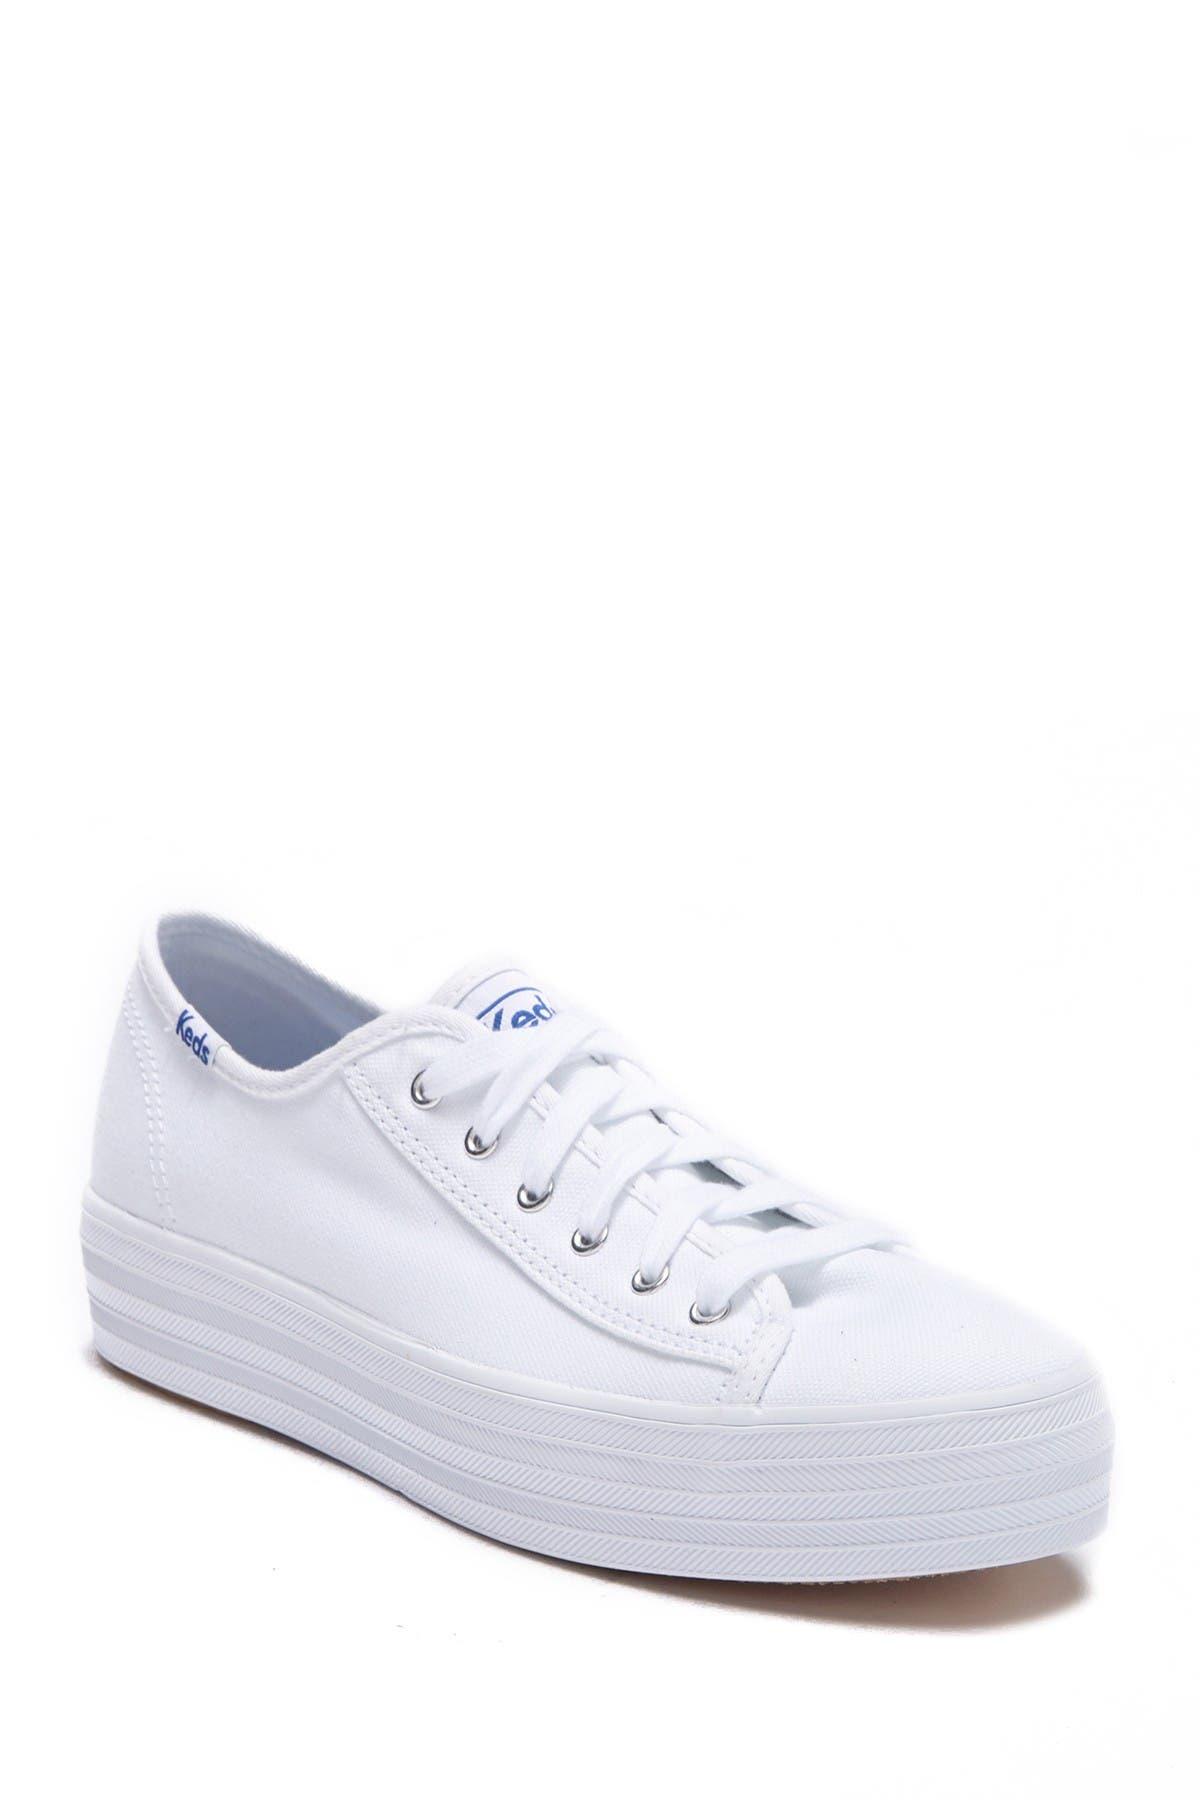 Image of Keds Triple Kick Canvas Sneaker